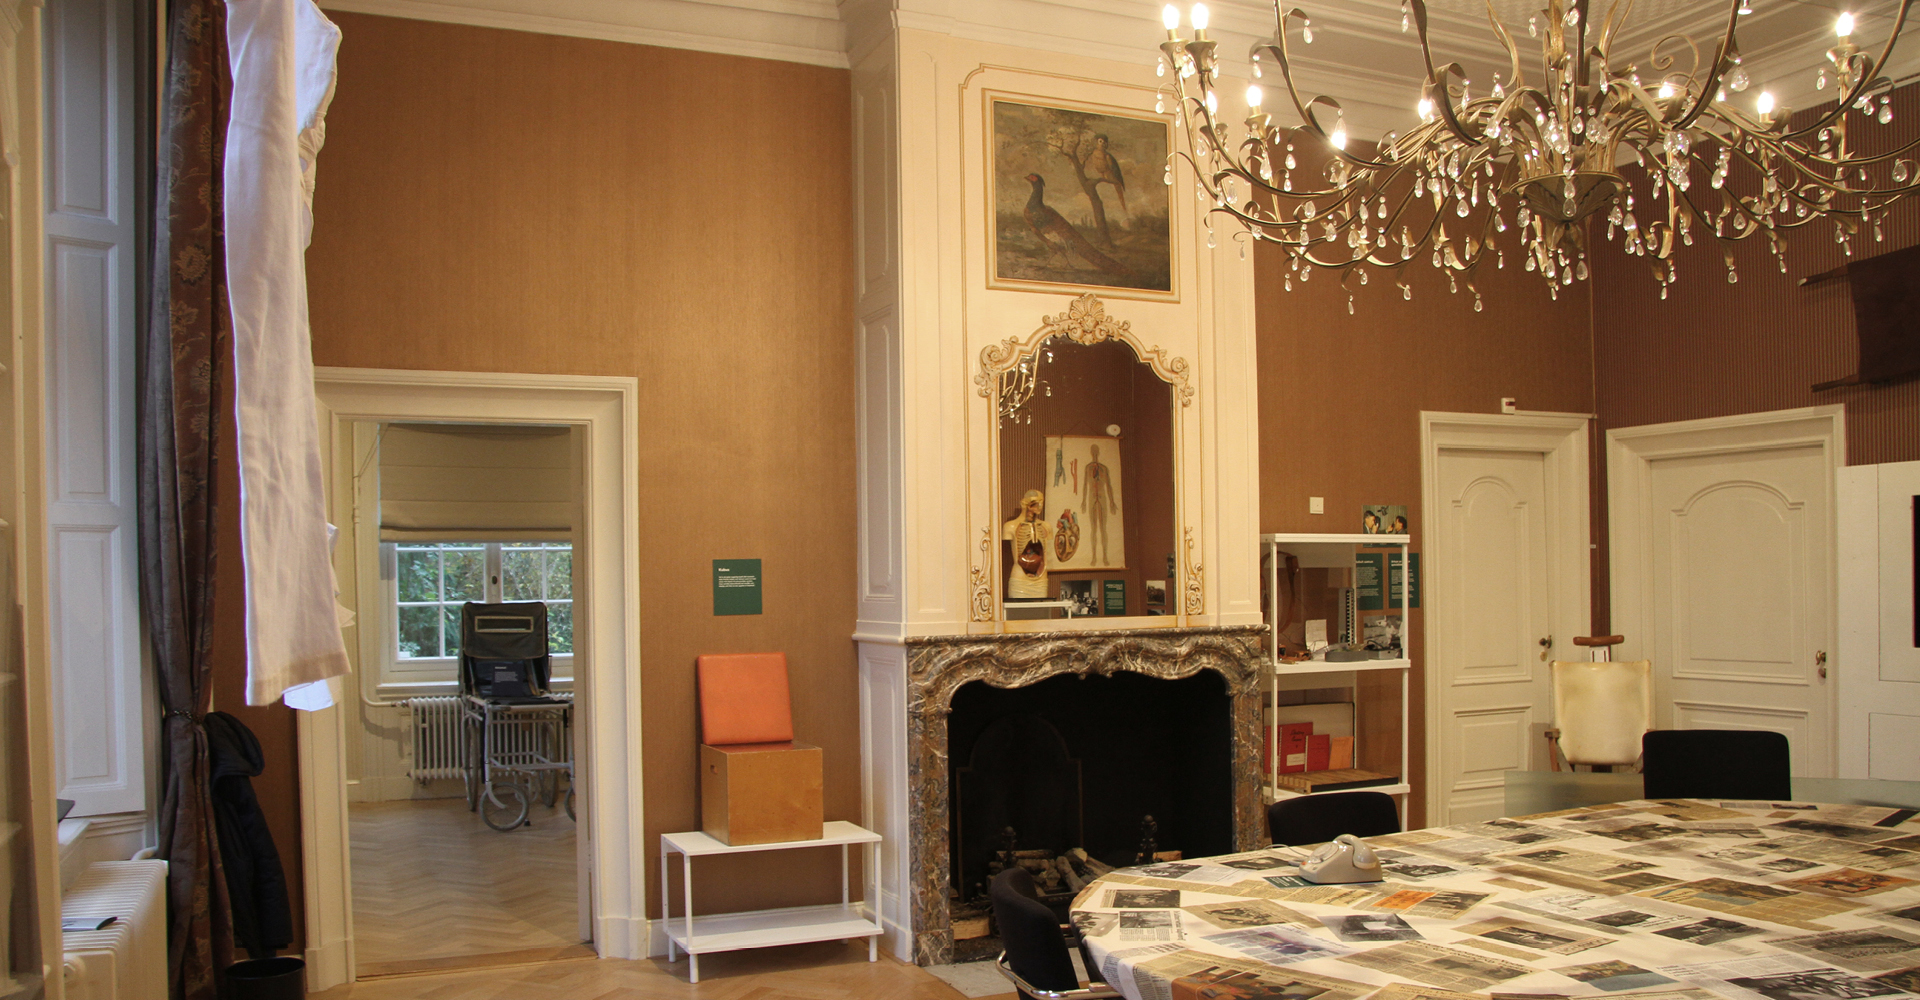 Museum Zozijn Wilp Johan Akkerman5